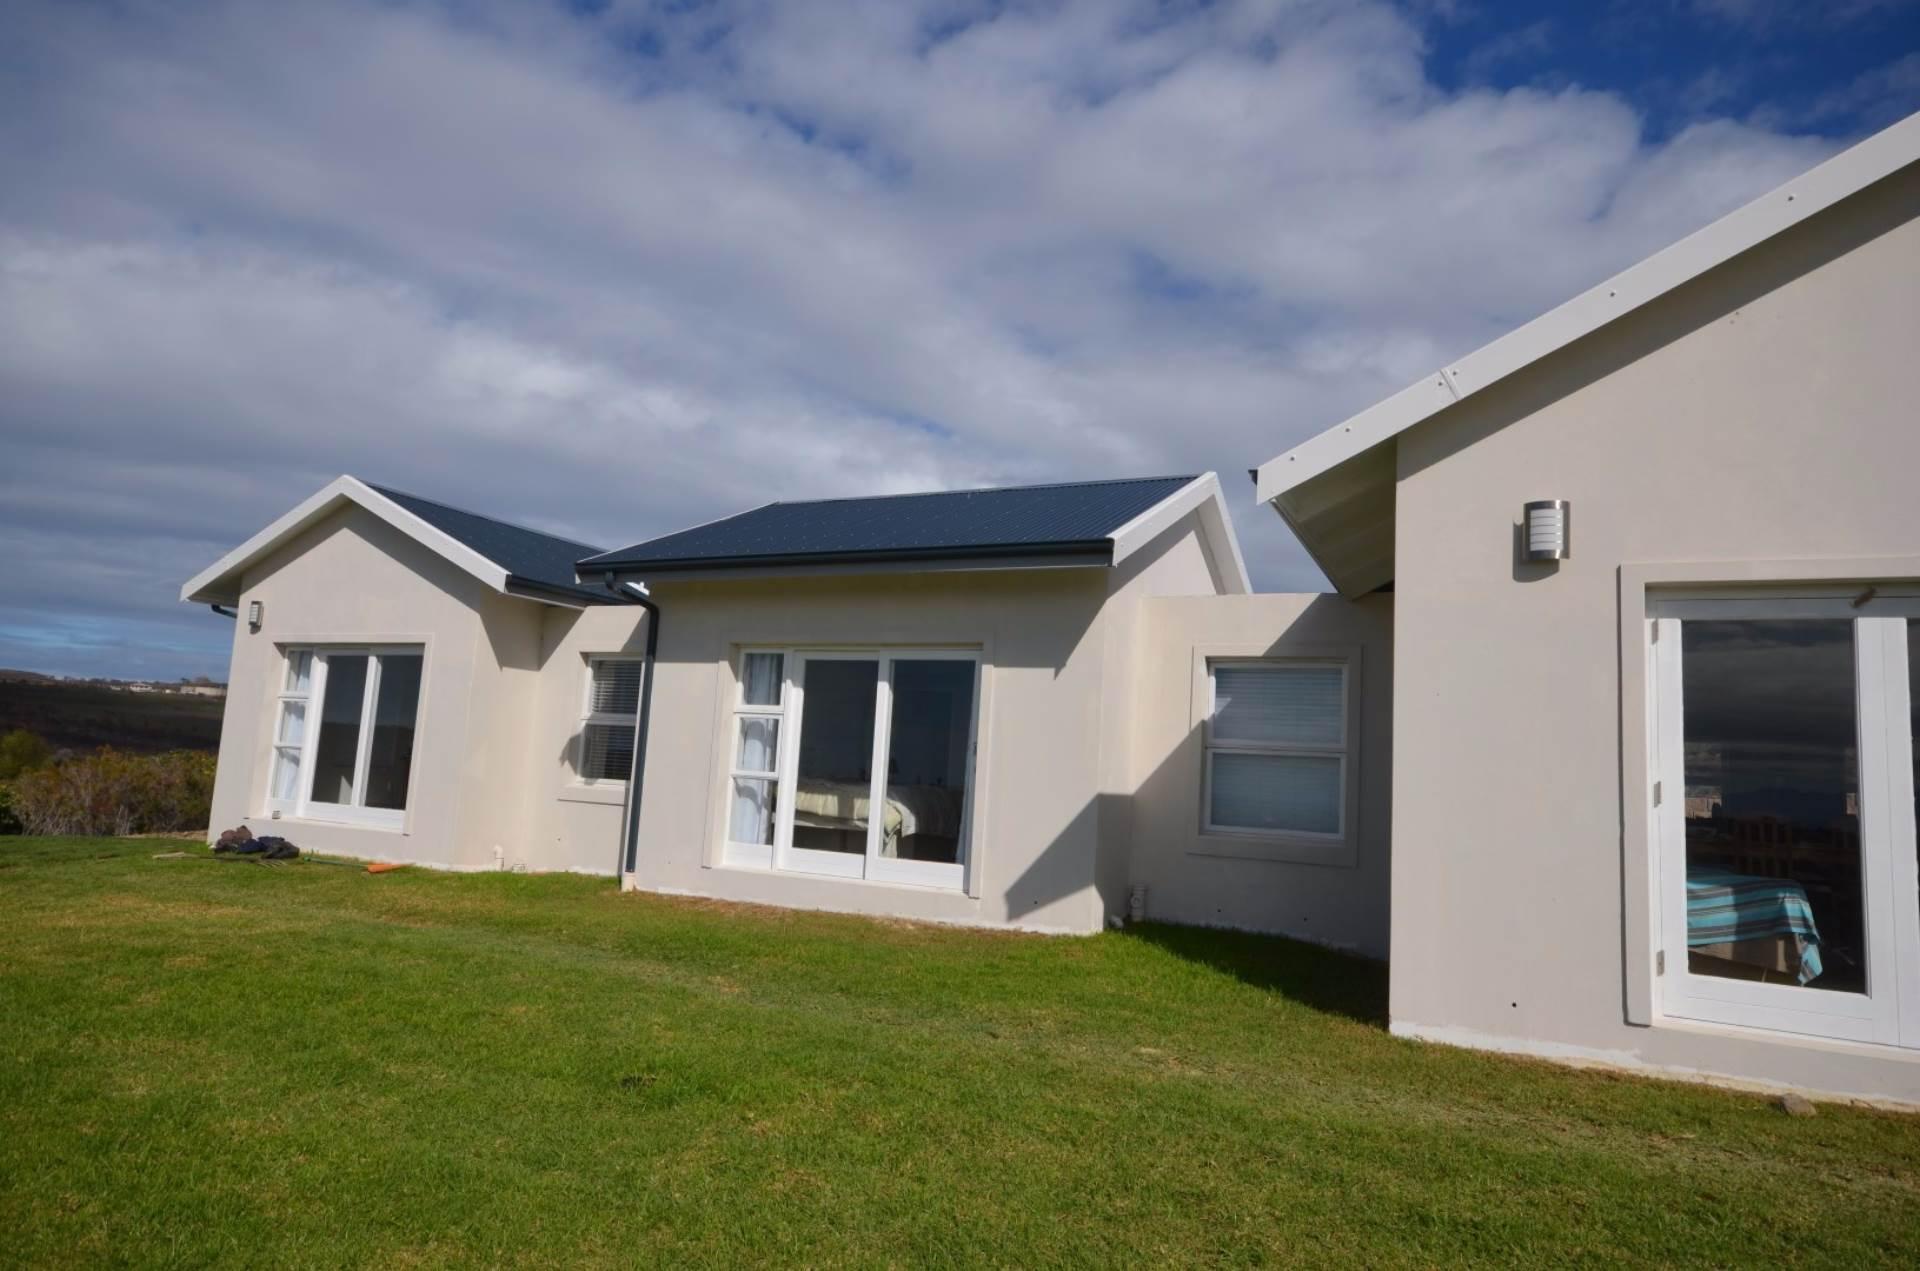 3 BedroomHouse For Sale In Brackenridge